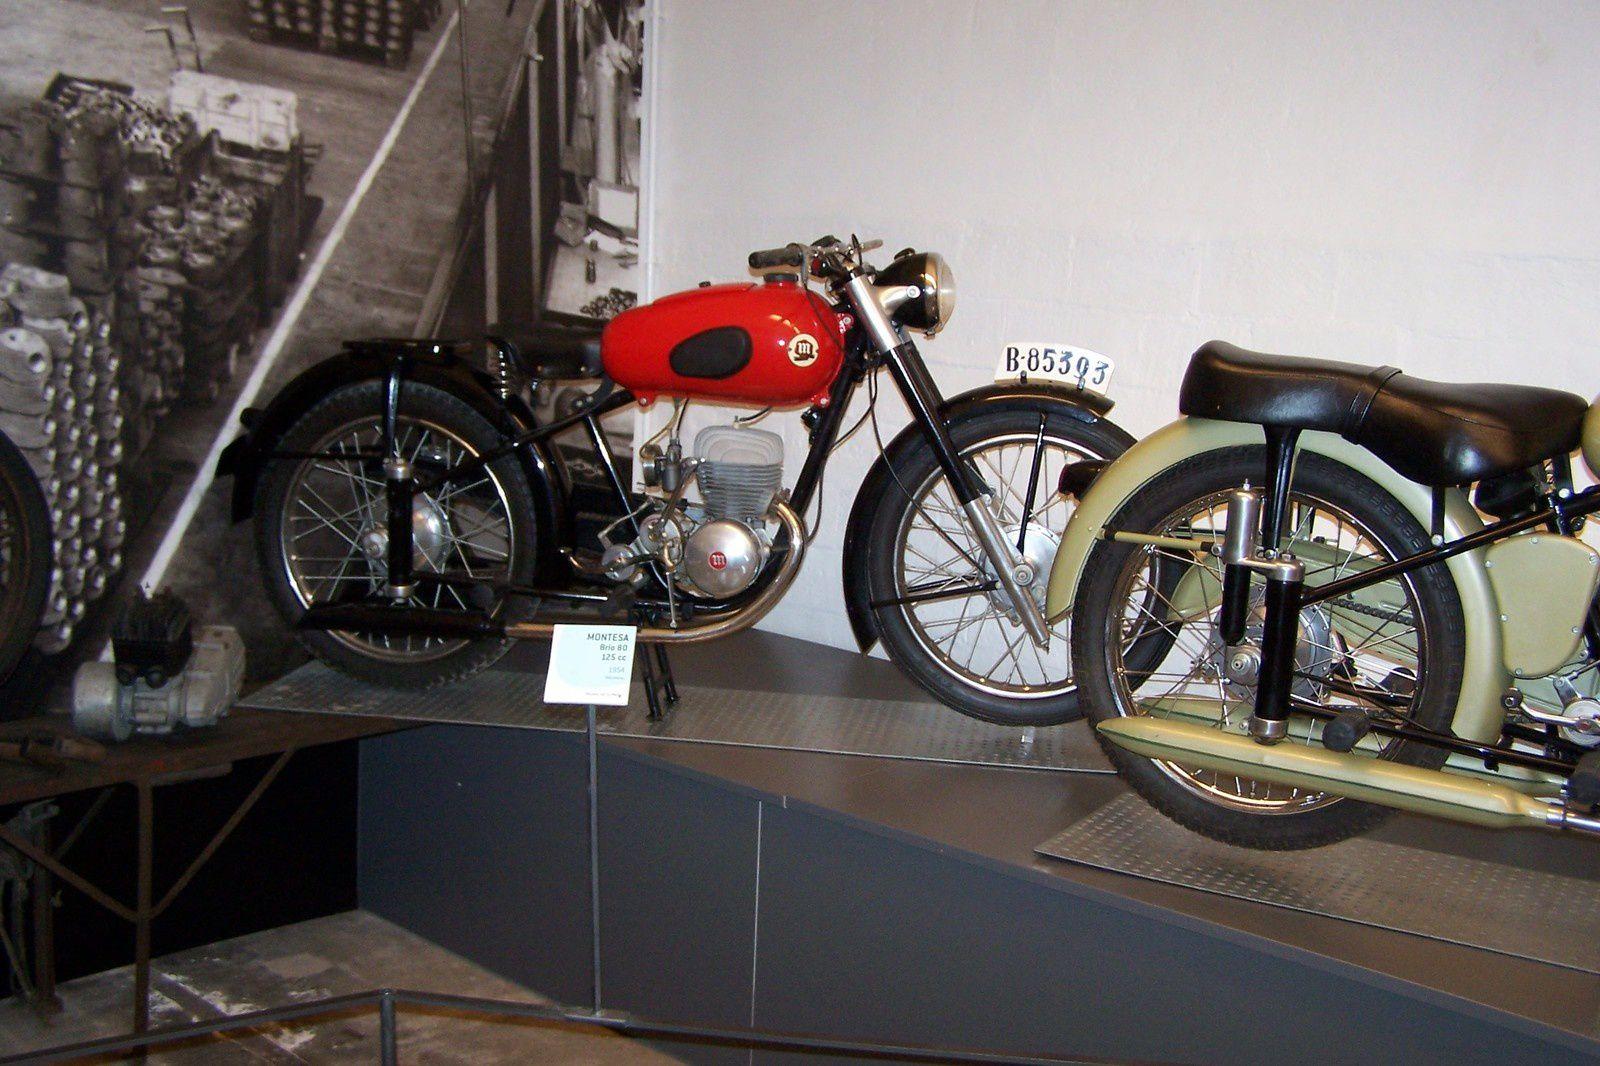 26-09-2015 MUSEE DE LA MOTO BARCELONE